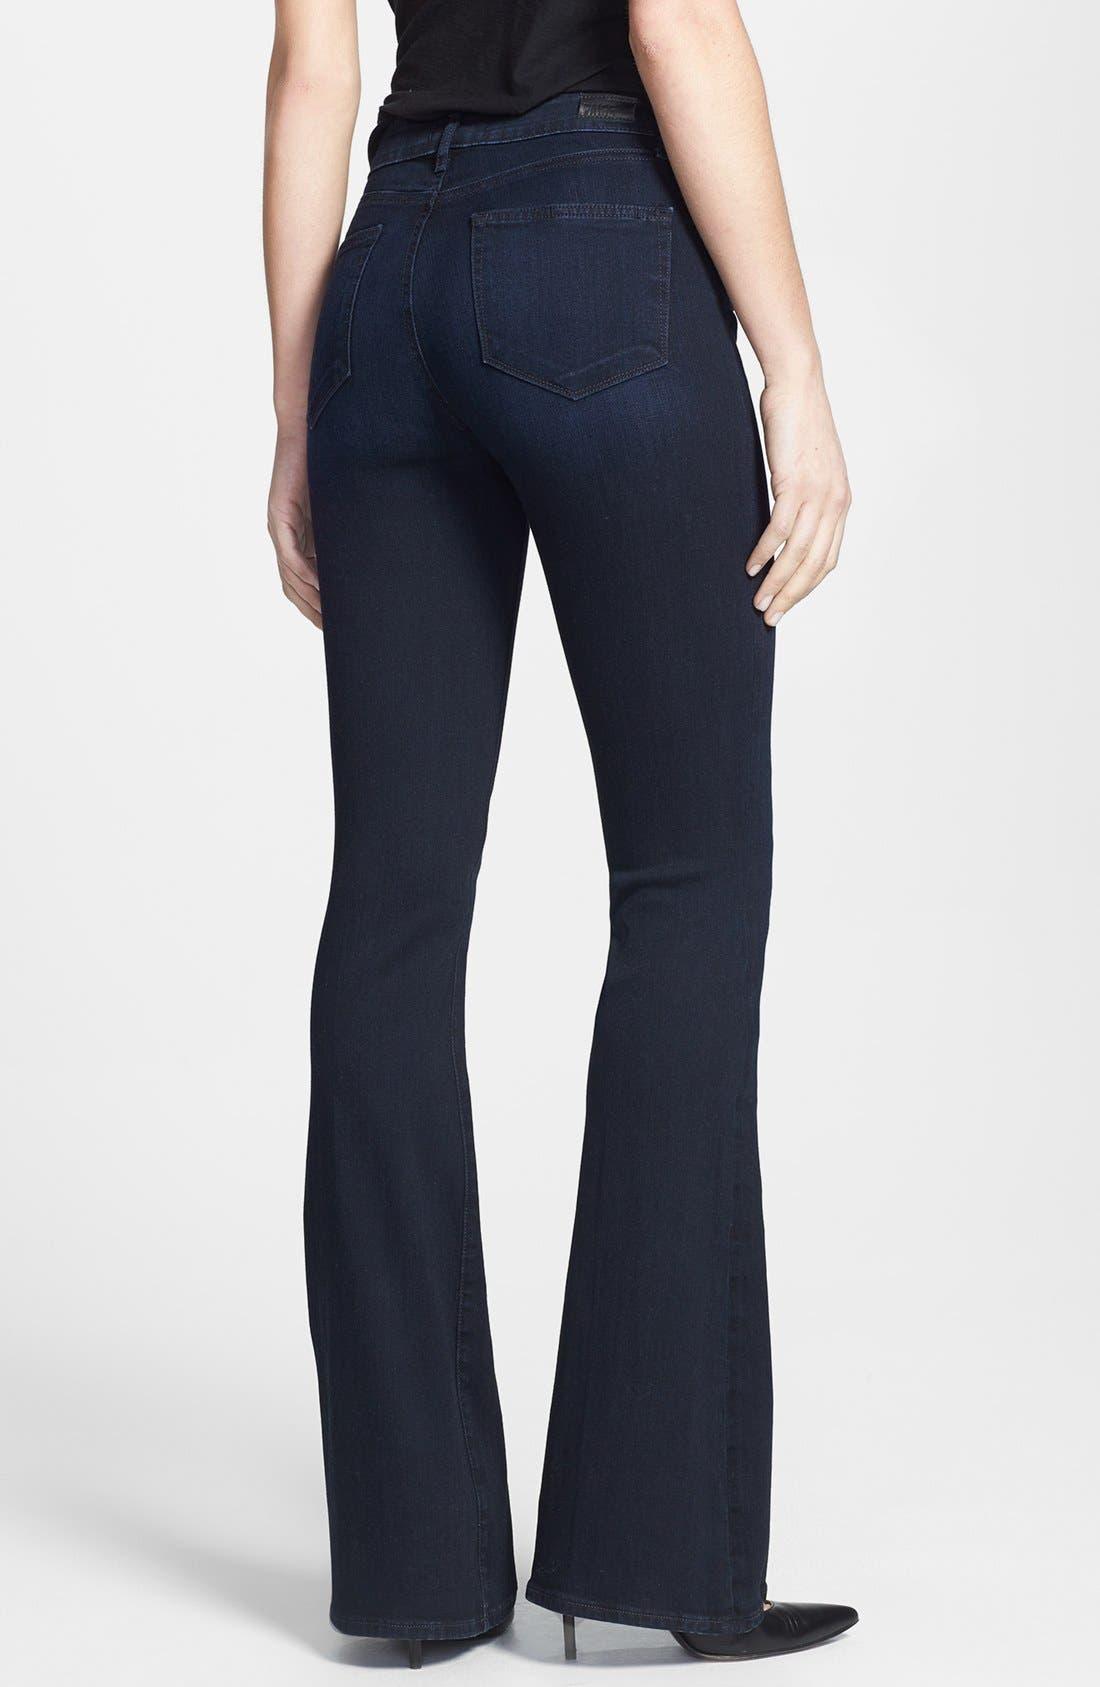 Alternate Image 2  - Paige Denim 'Canyon' High Rise Bell Bottom Jeans (Peyton)